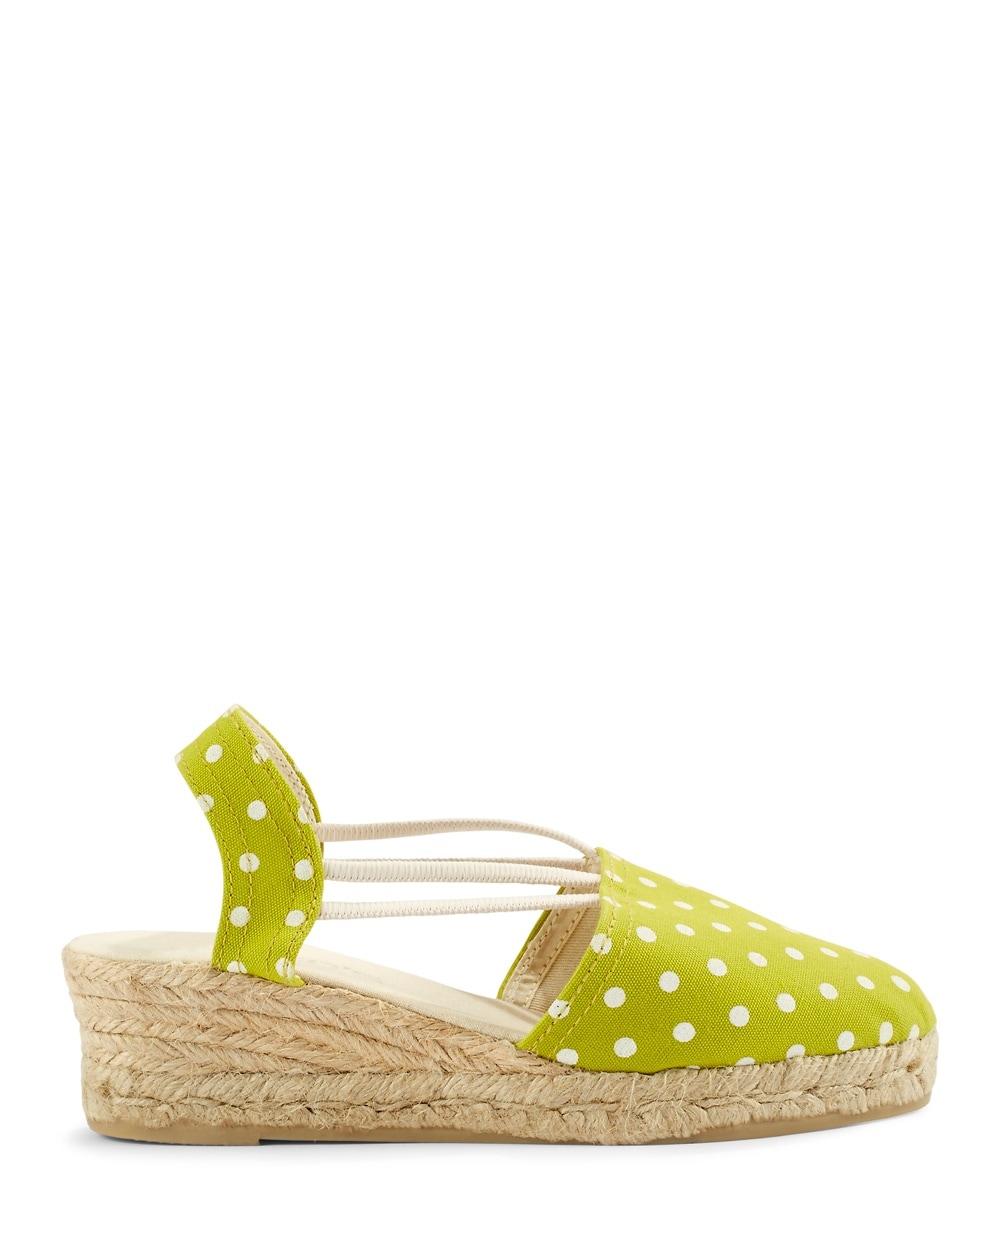 Dot Lime Green Espadrille Green Dot Lime Dot Sandals Espadrille Lime Sandals Green Espadrille 6ybf7gY